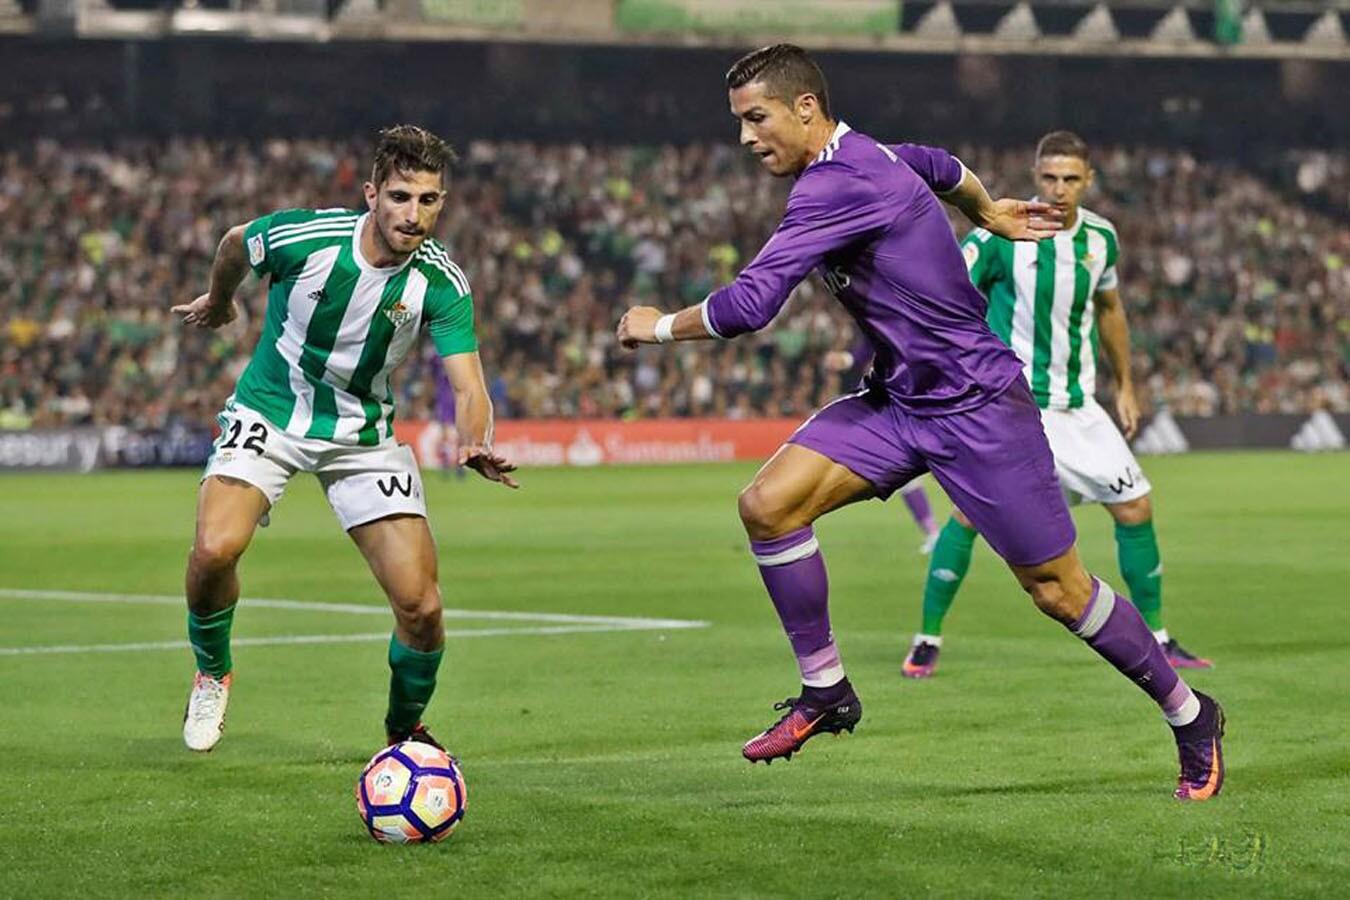 Betis 1-6 Real Madrid